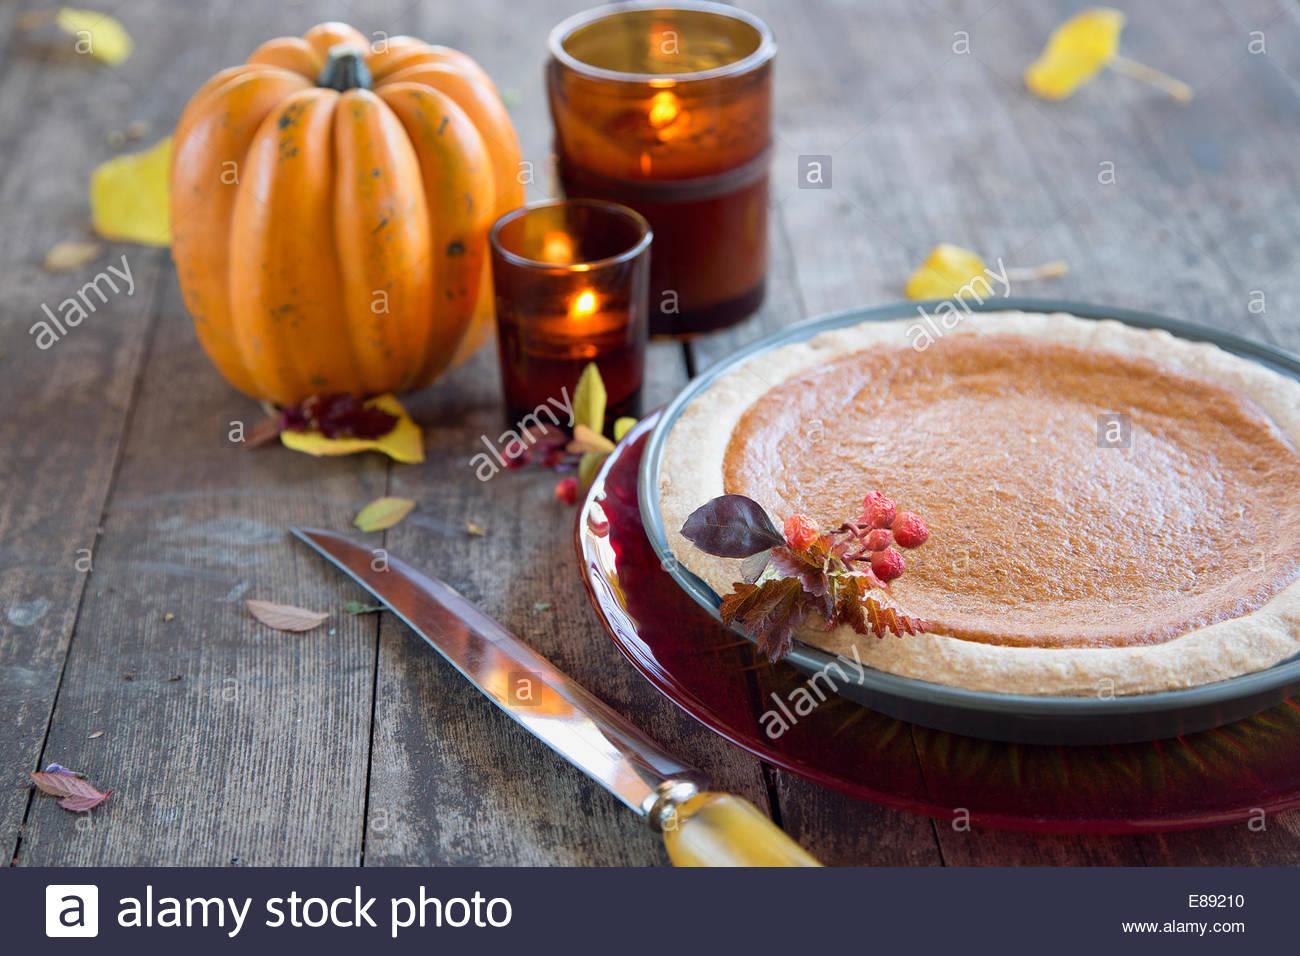 Pumpkin decoration with candles next to pumpkin pie - Stock Image